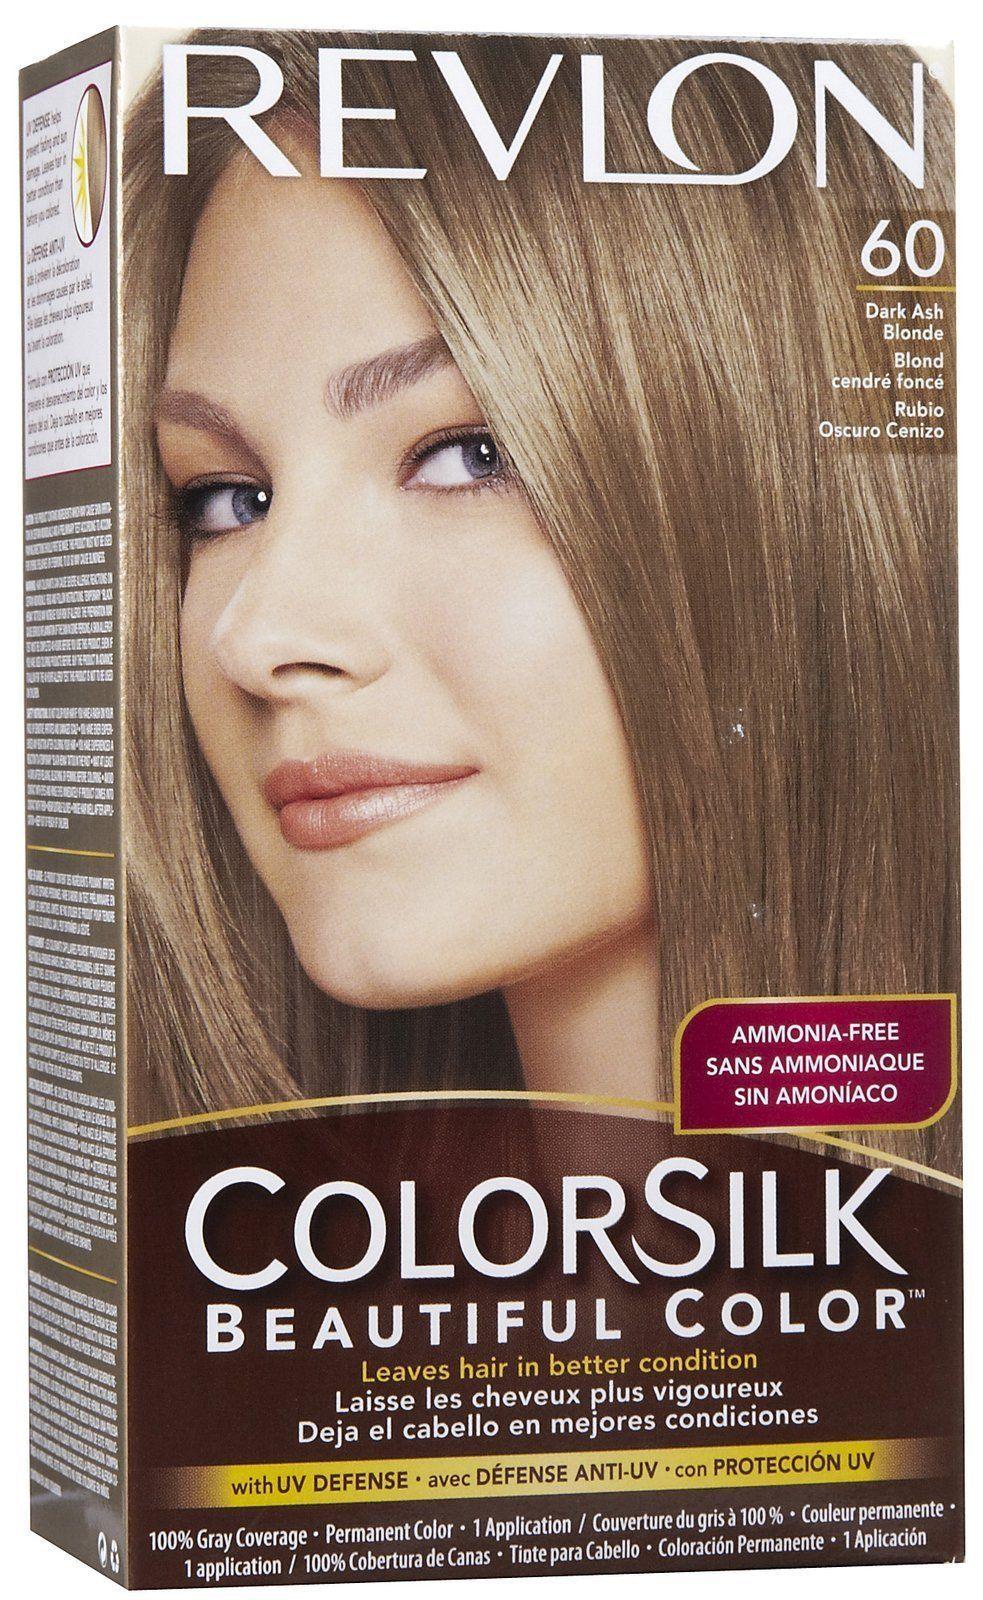 Revlon Colorsilk Hair Color 60 Dark Ash Blonde In 2018 Products